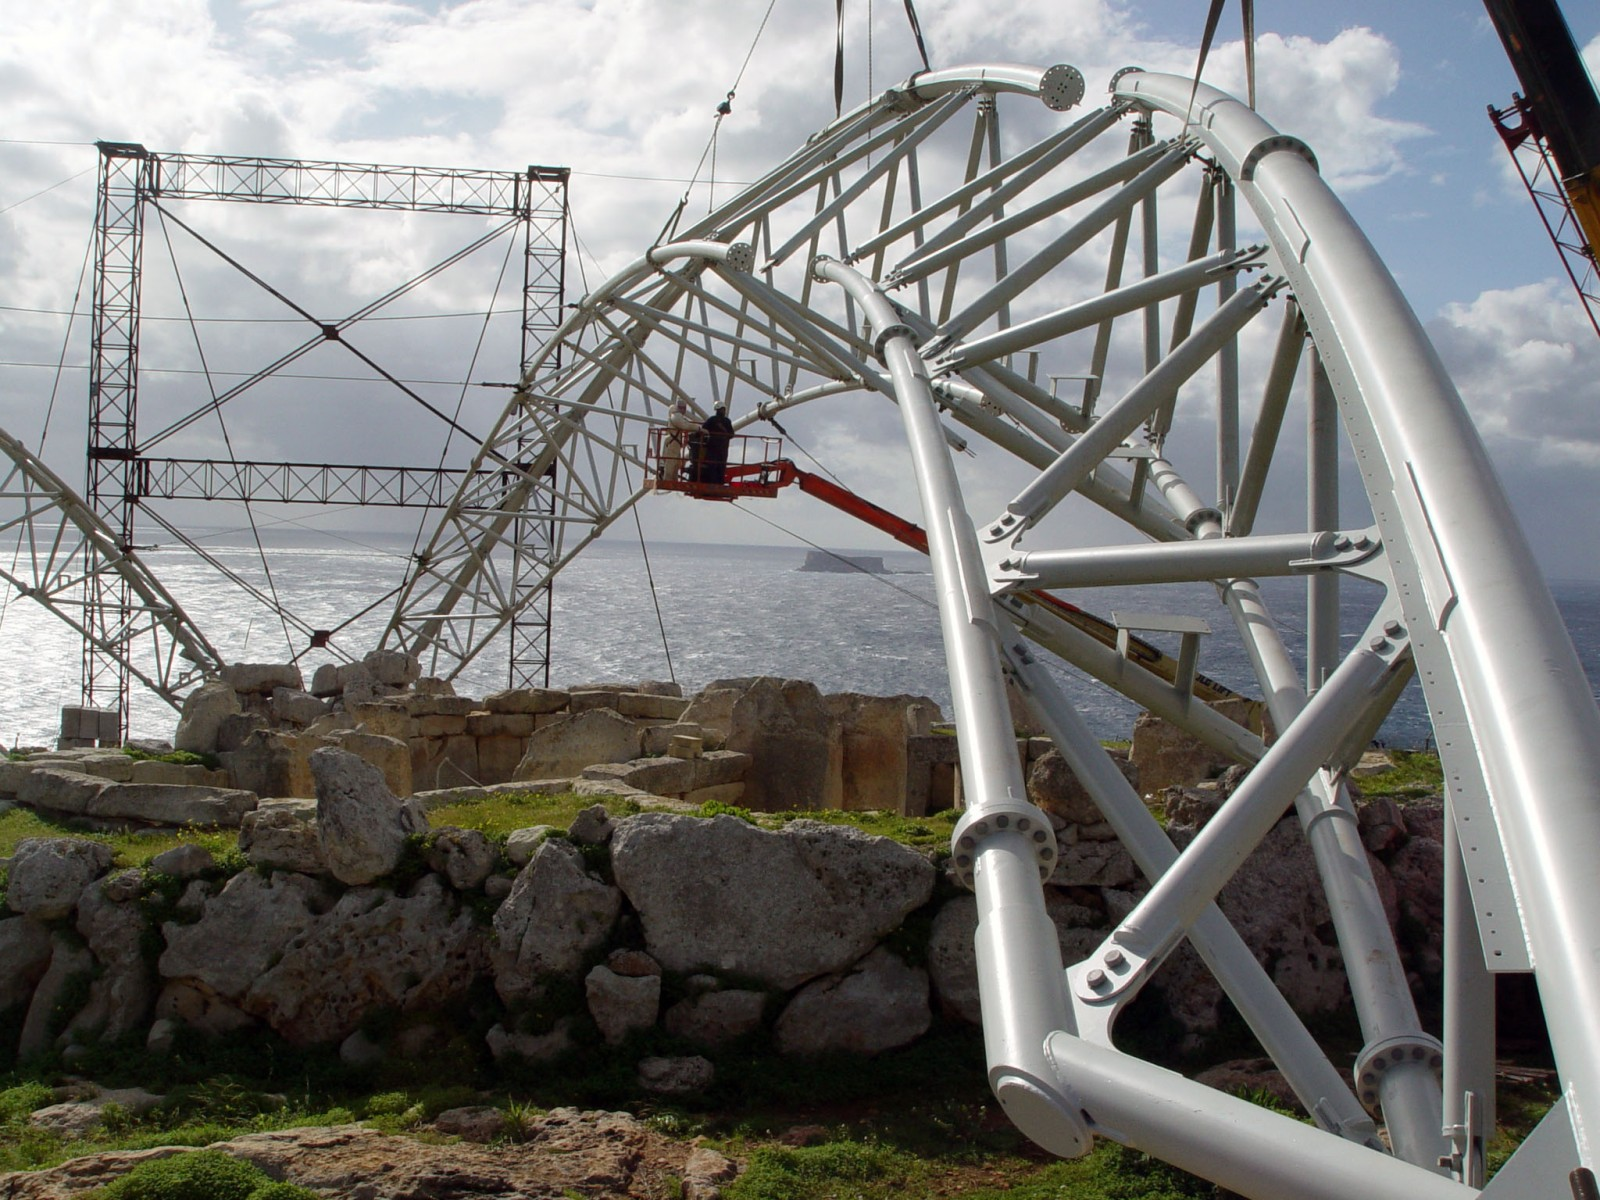 Hagar Qim and Mnajdra Temples Conservation and Interpretation Project